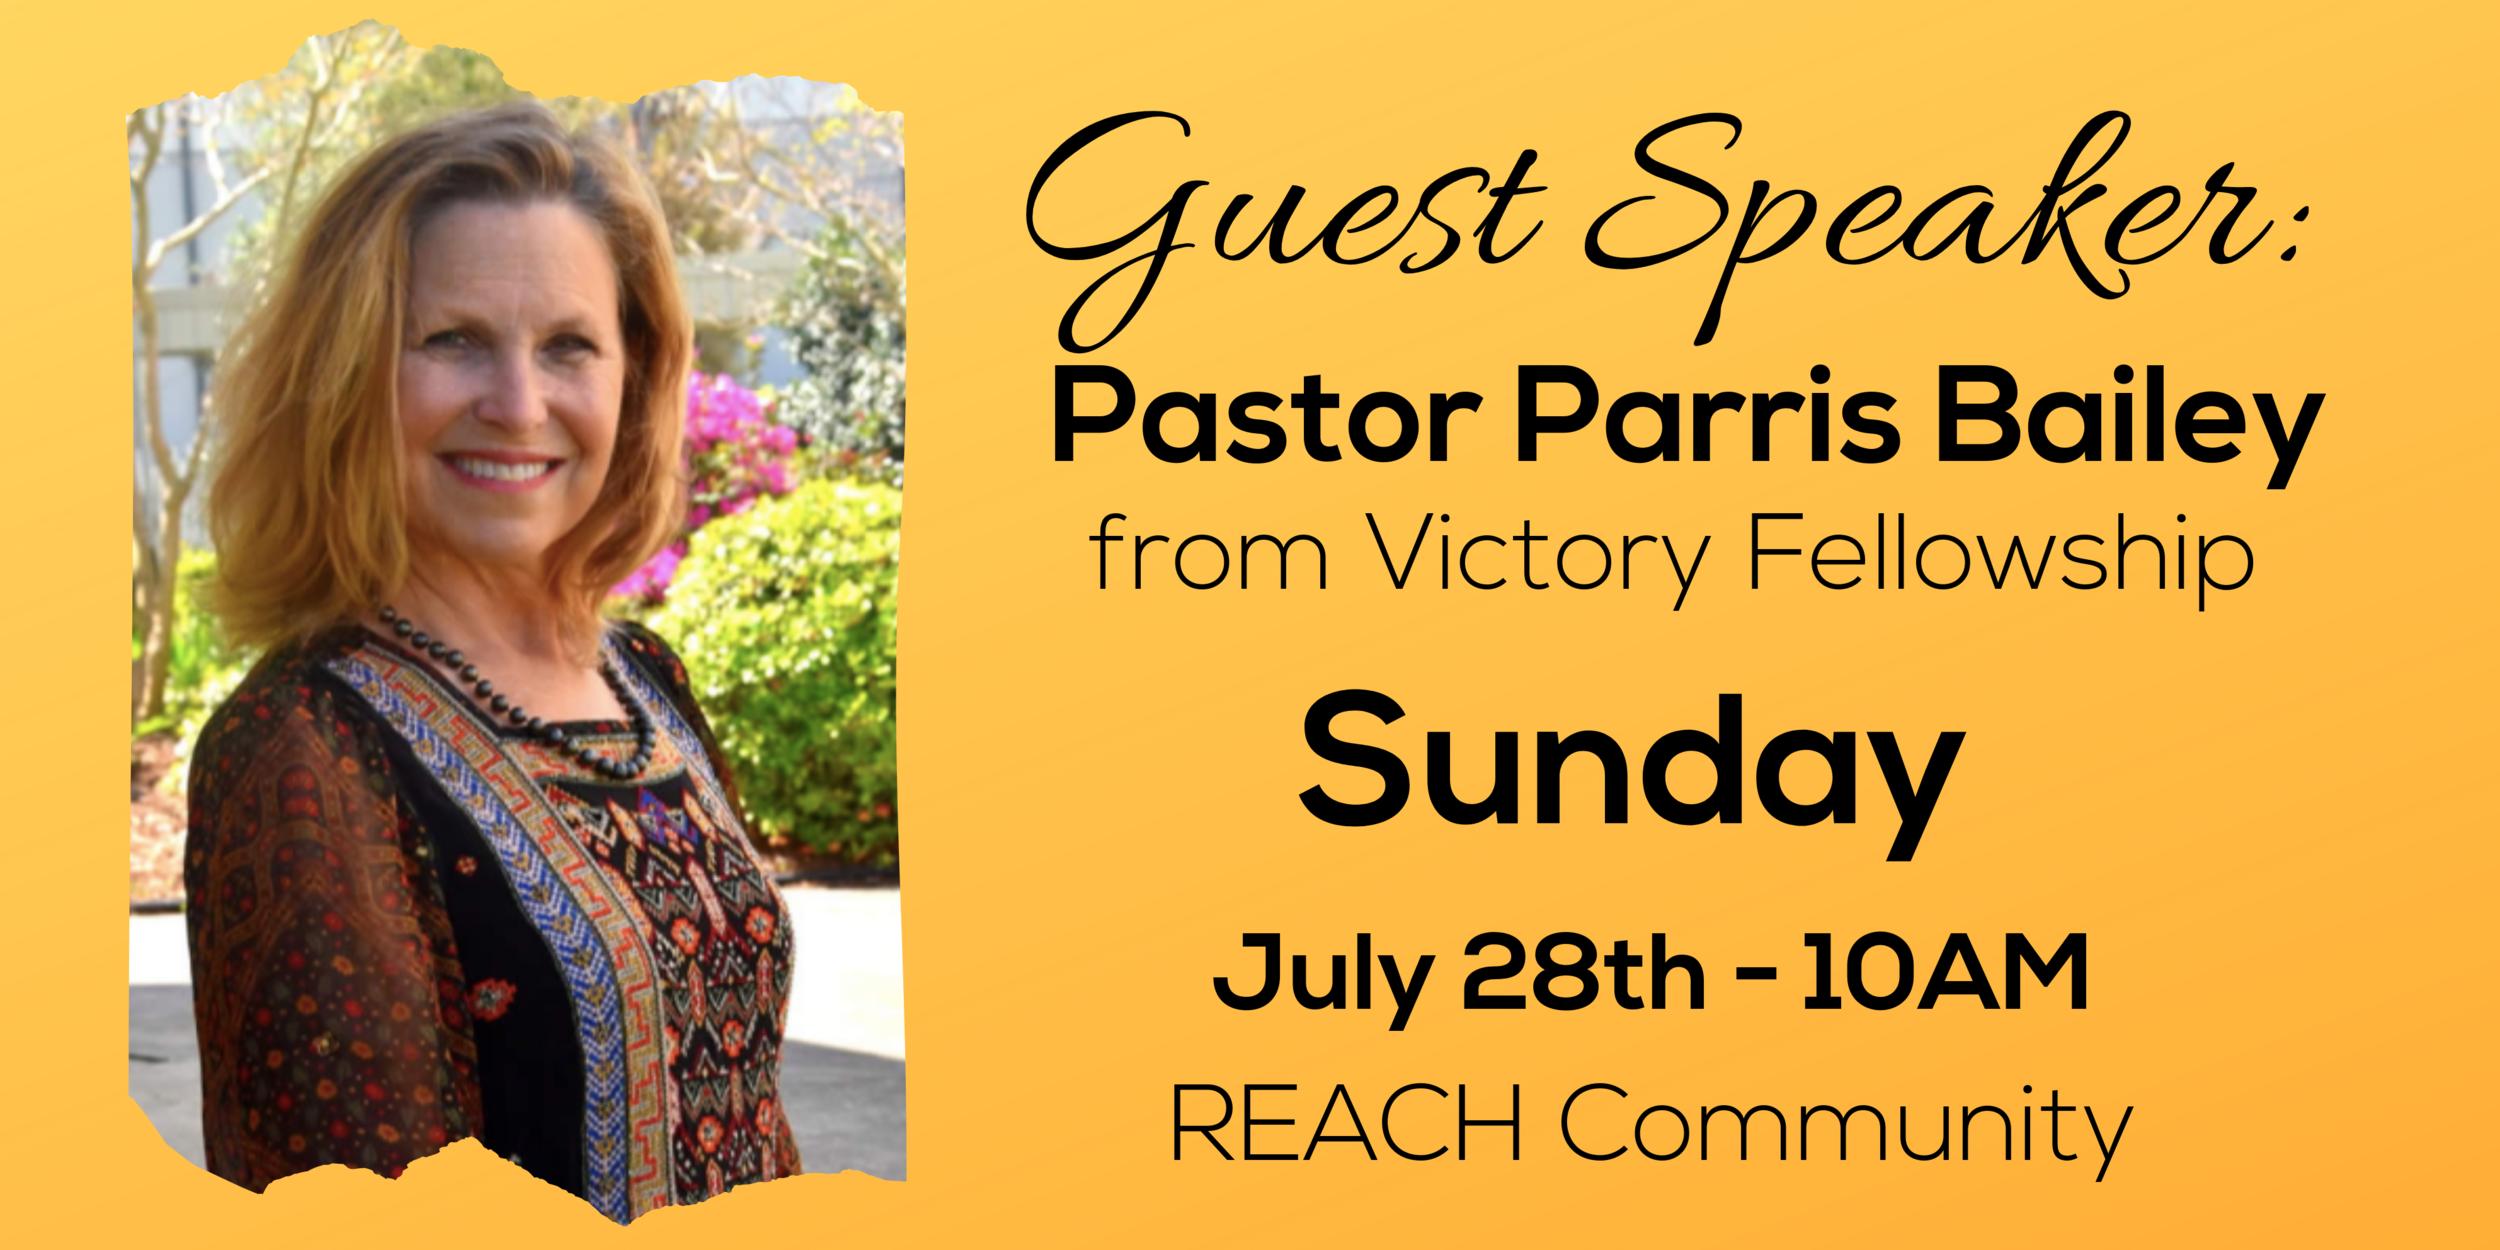 REACH Community in Covington Louisiana Guest Speaker Pastor Parris Bailey